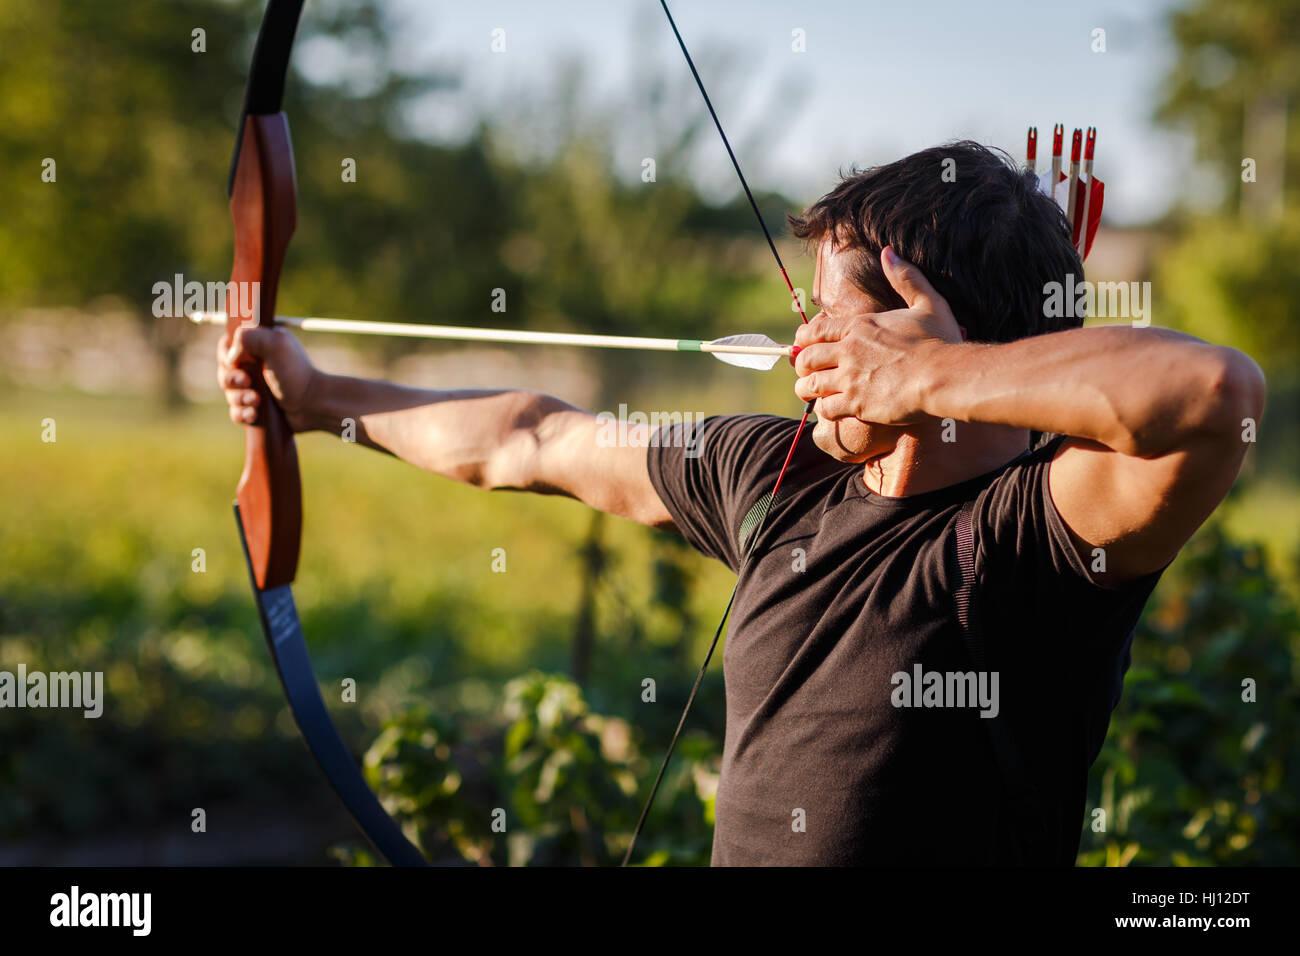 archer, bow, arrow, activity, shoot, danger, spare time